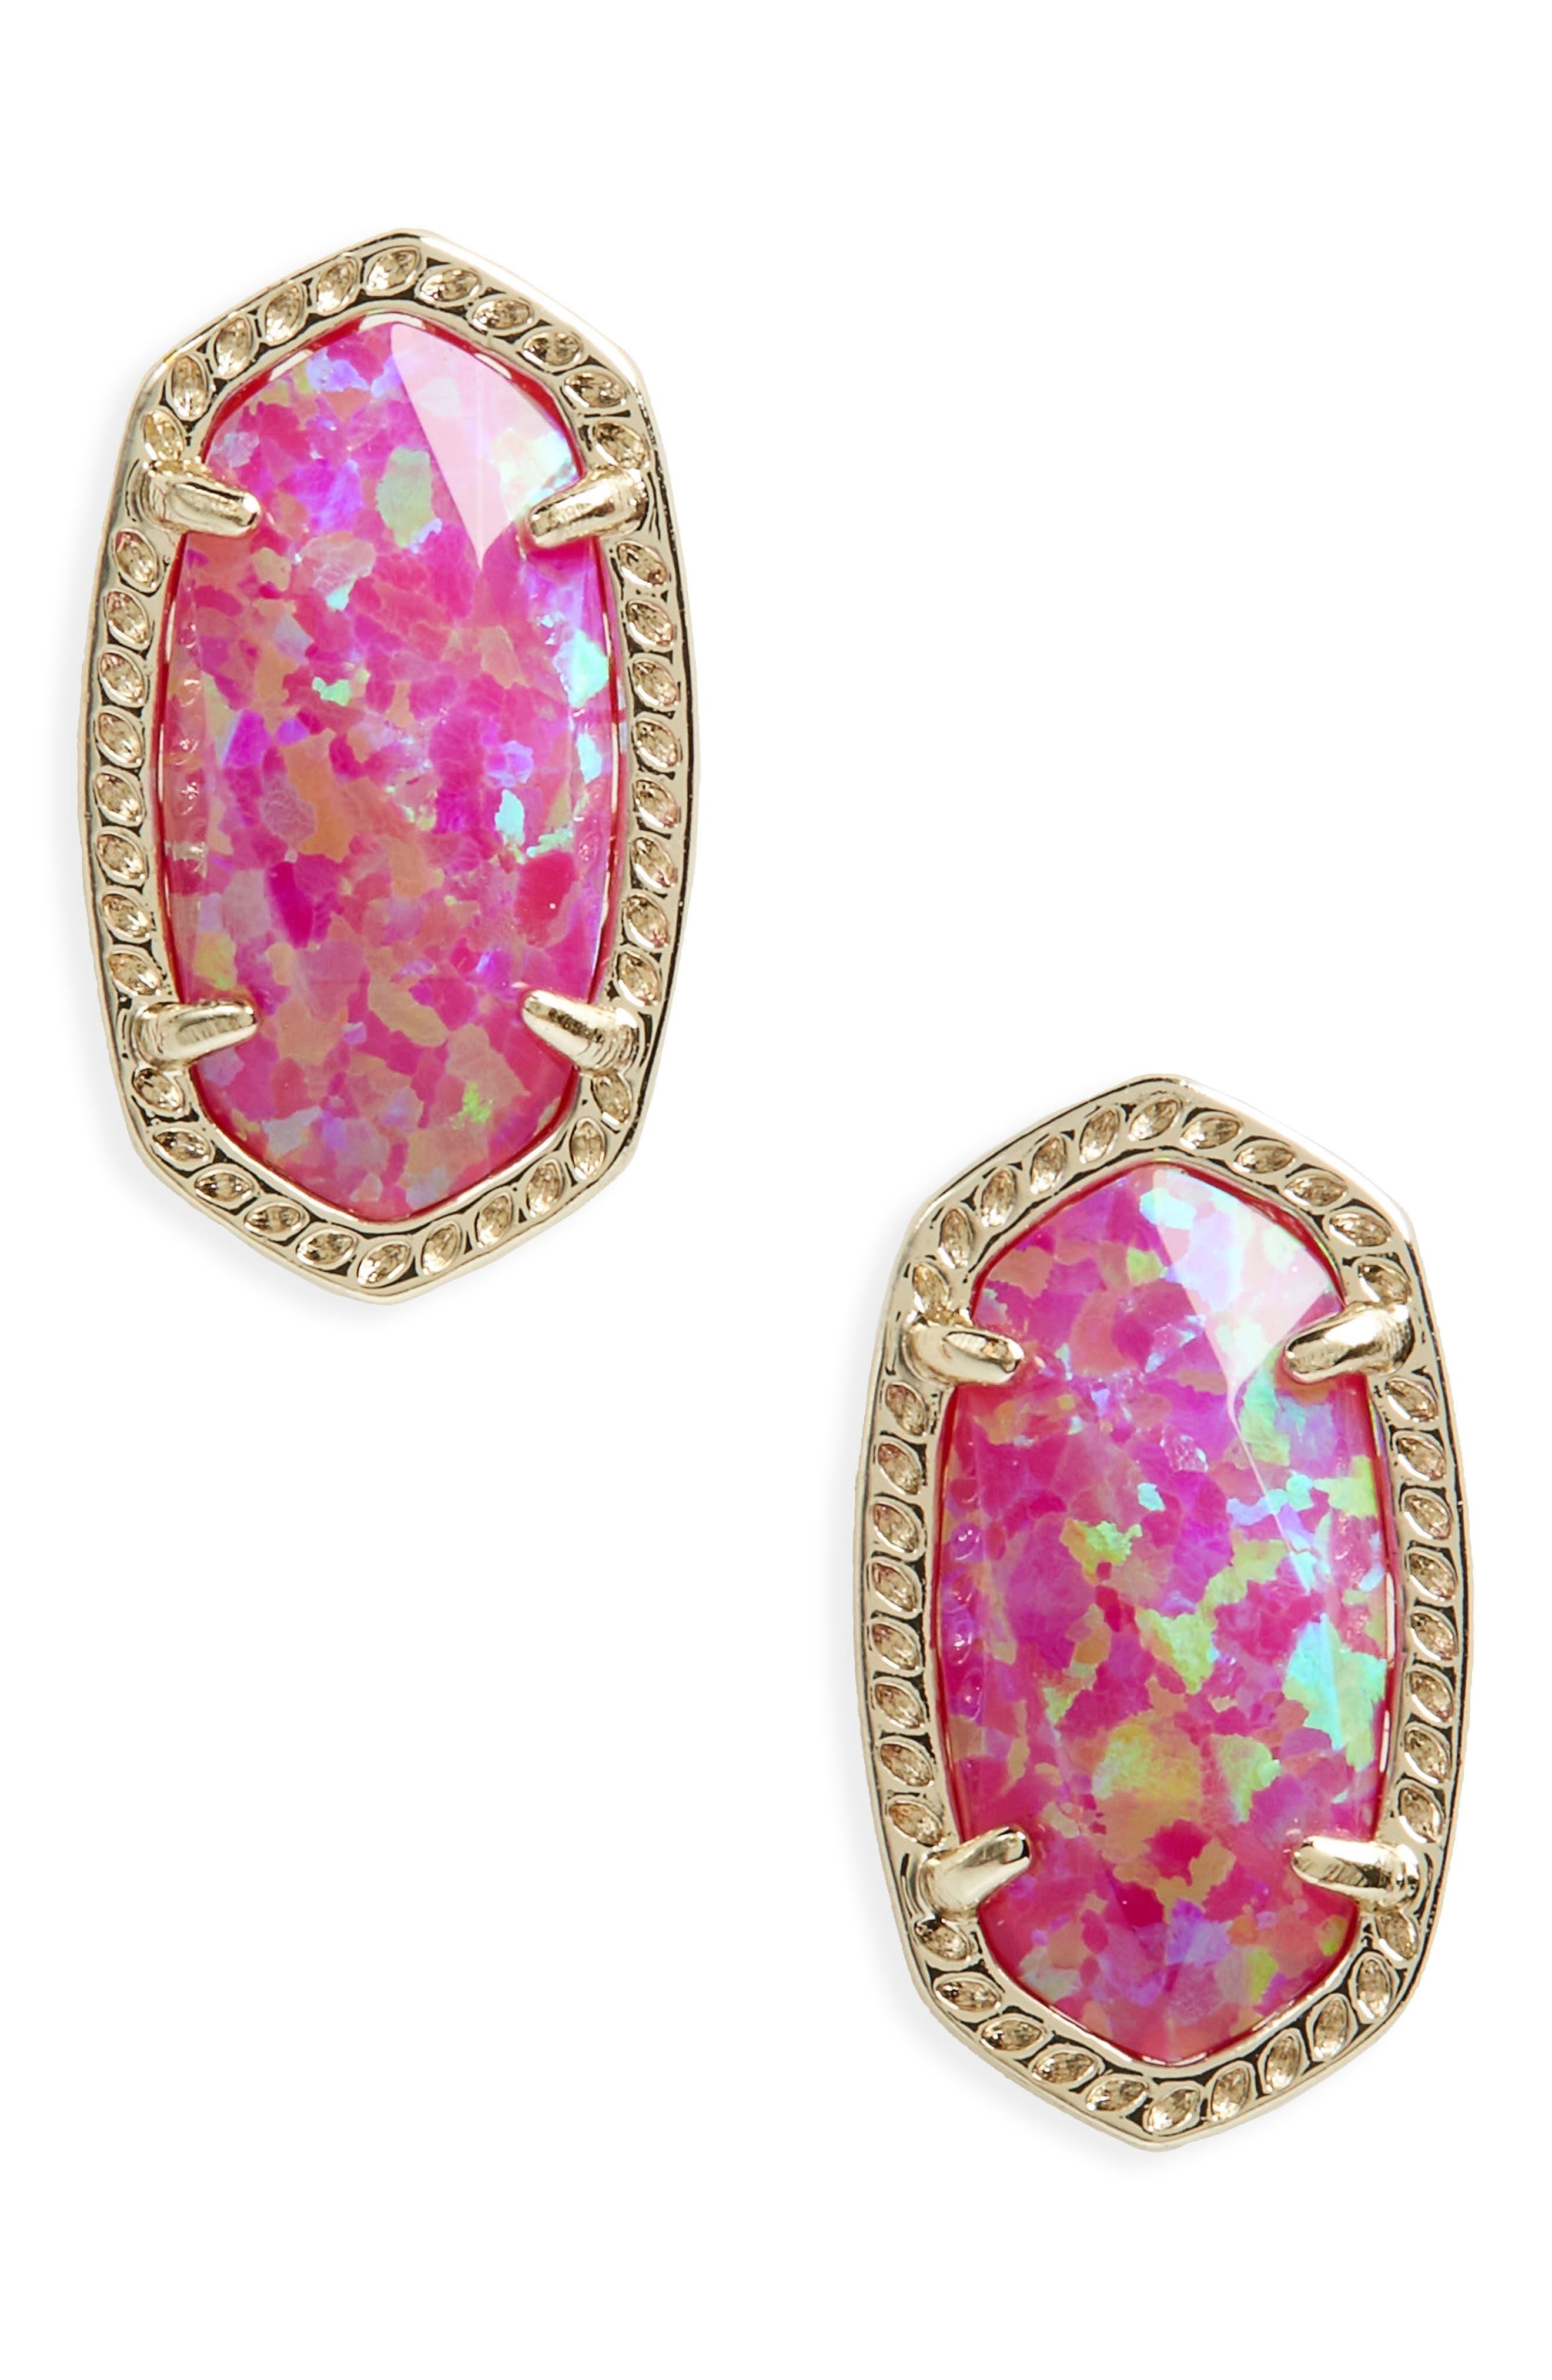 Ellie Earrings,                             Main thumbnail 1, color,                             Pink Kyocera Opal/ Gold